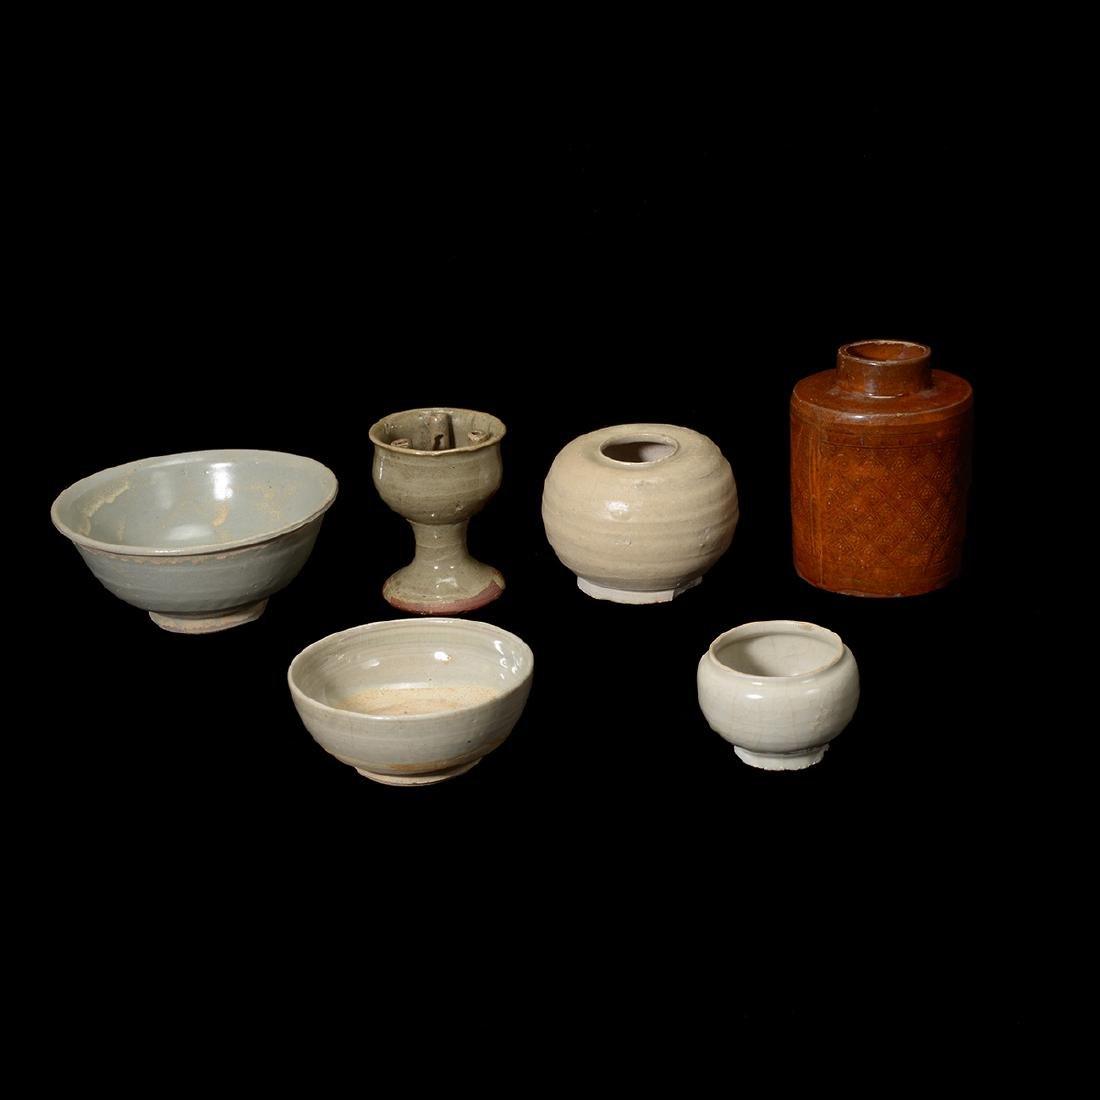 Six Crackle Glazed Ceramics